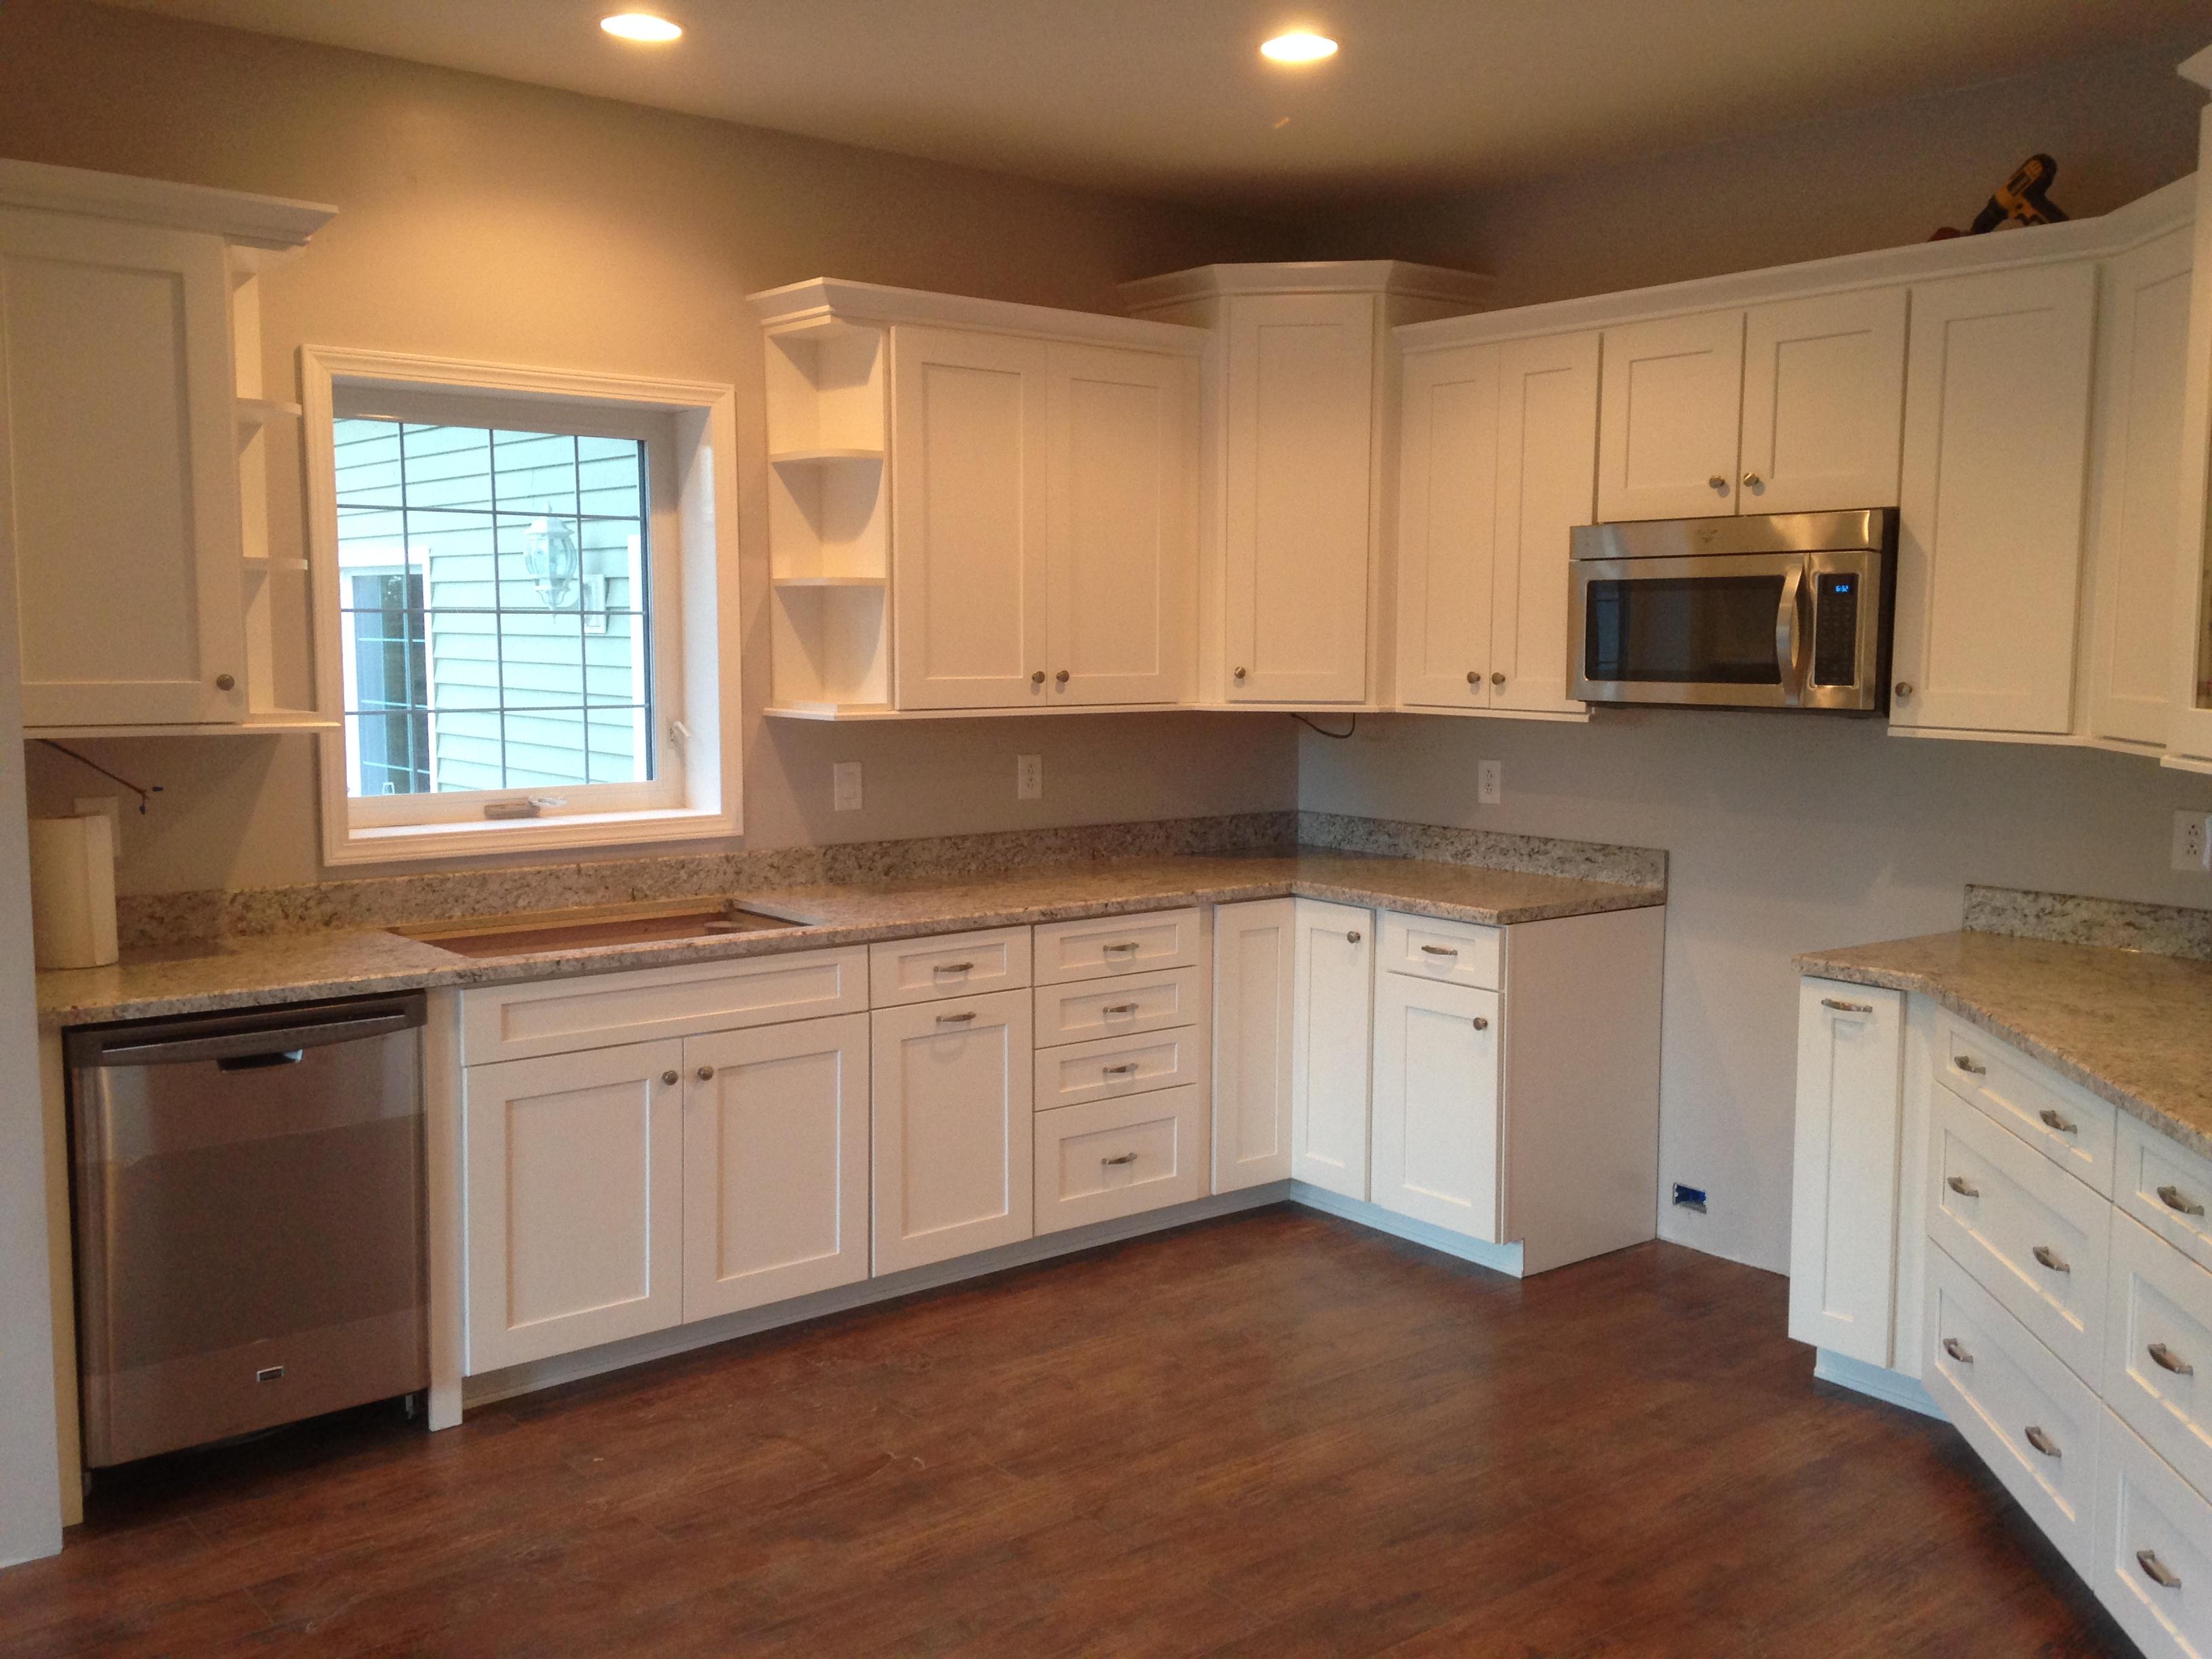 Beautifully remodeled Kitchen